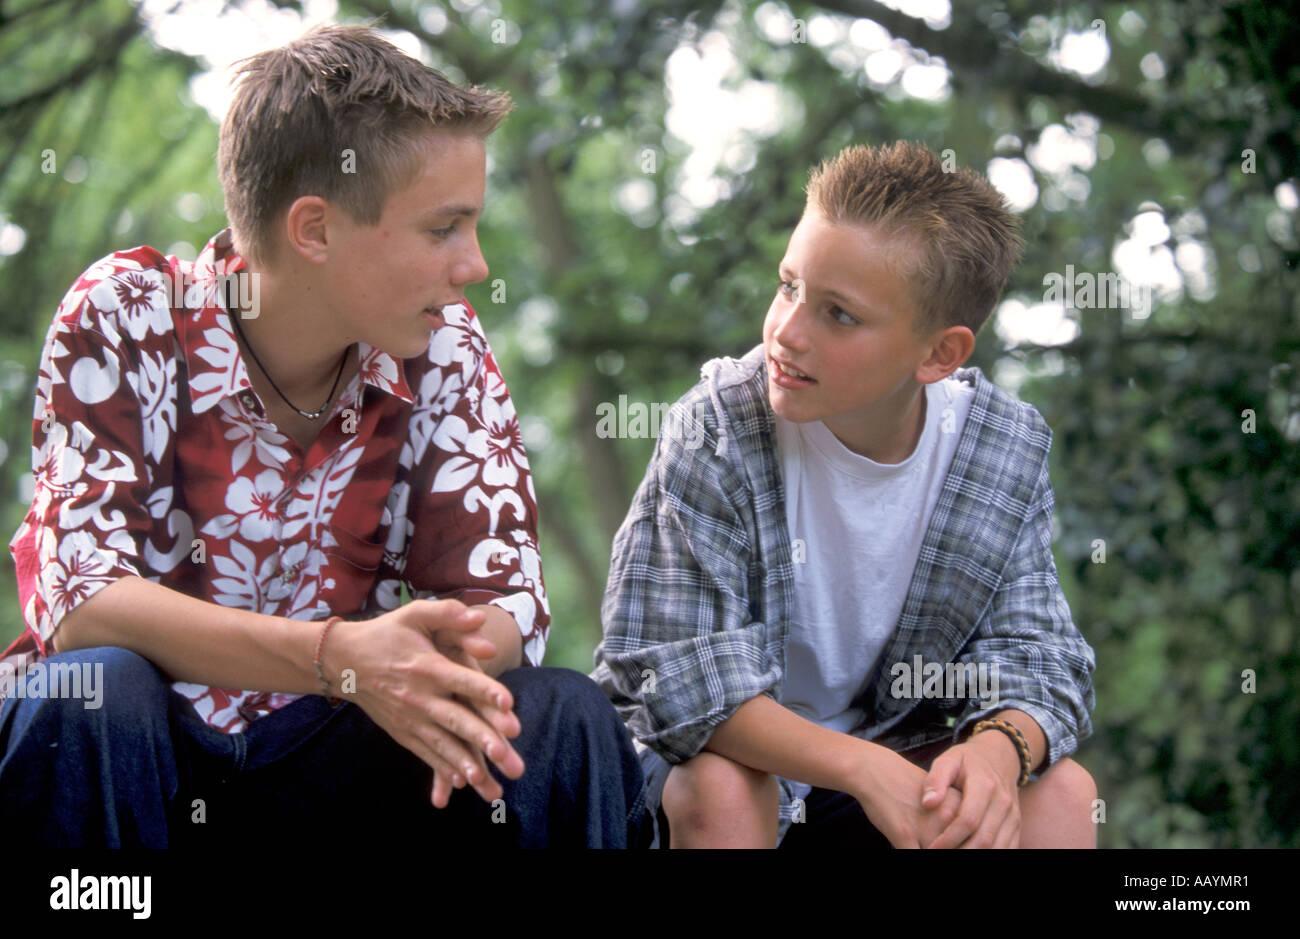 Two teenage boys talking together Stock Photo: 7274096 - Alamy